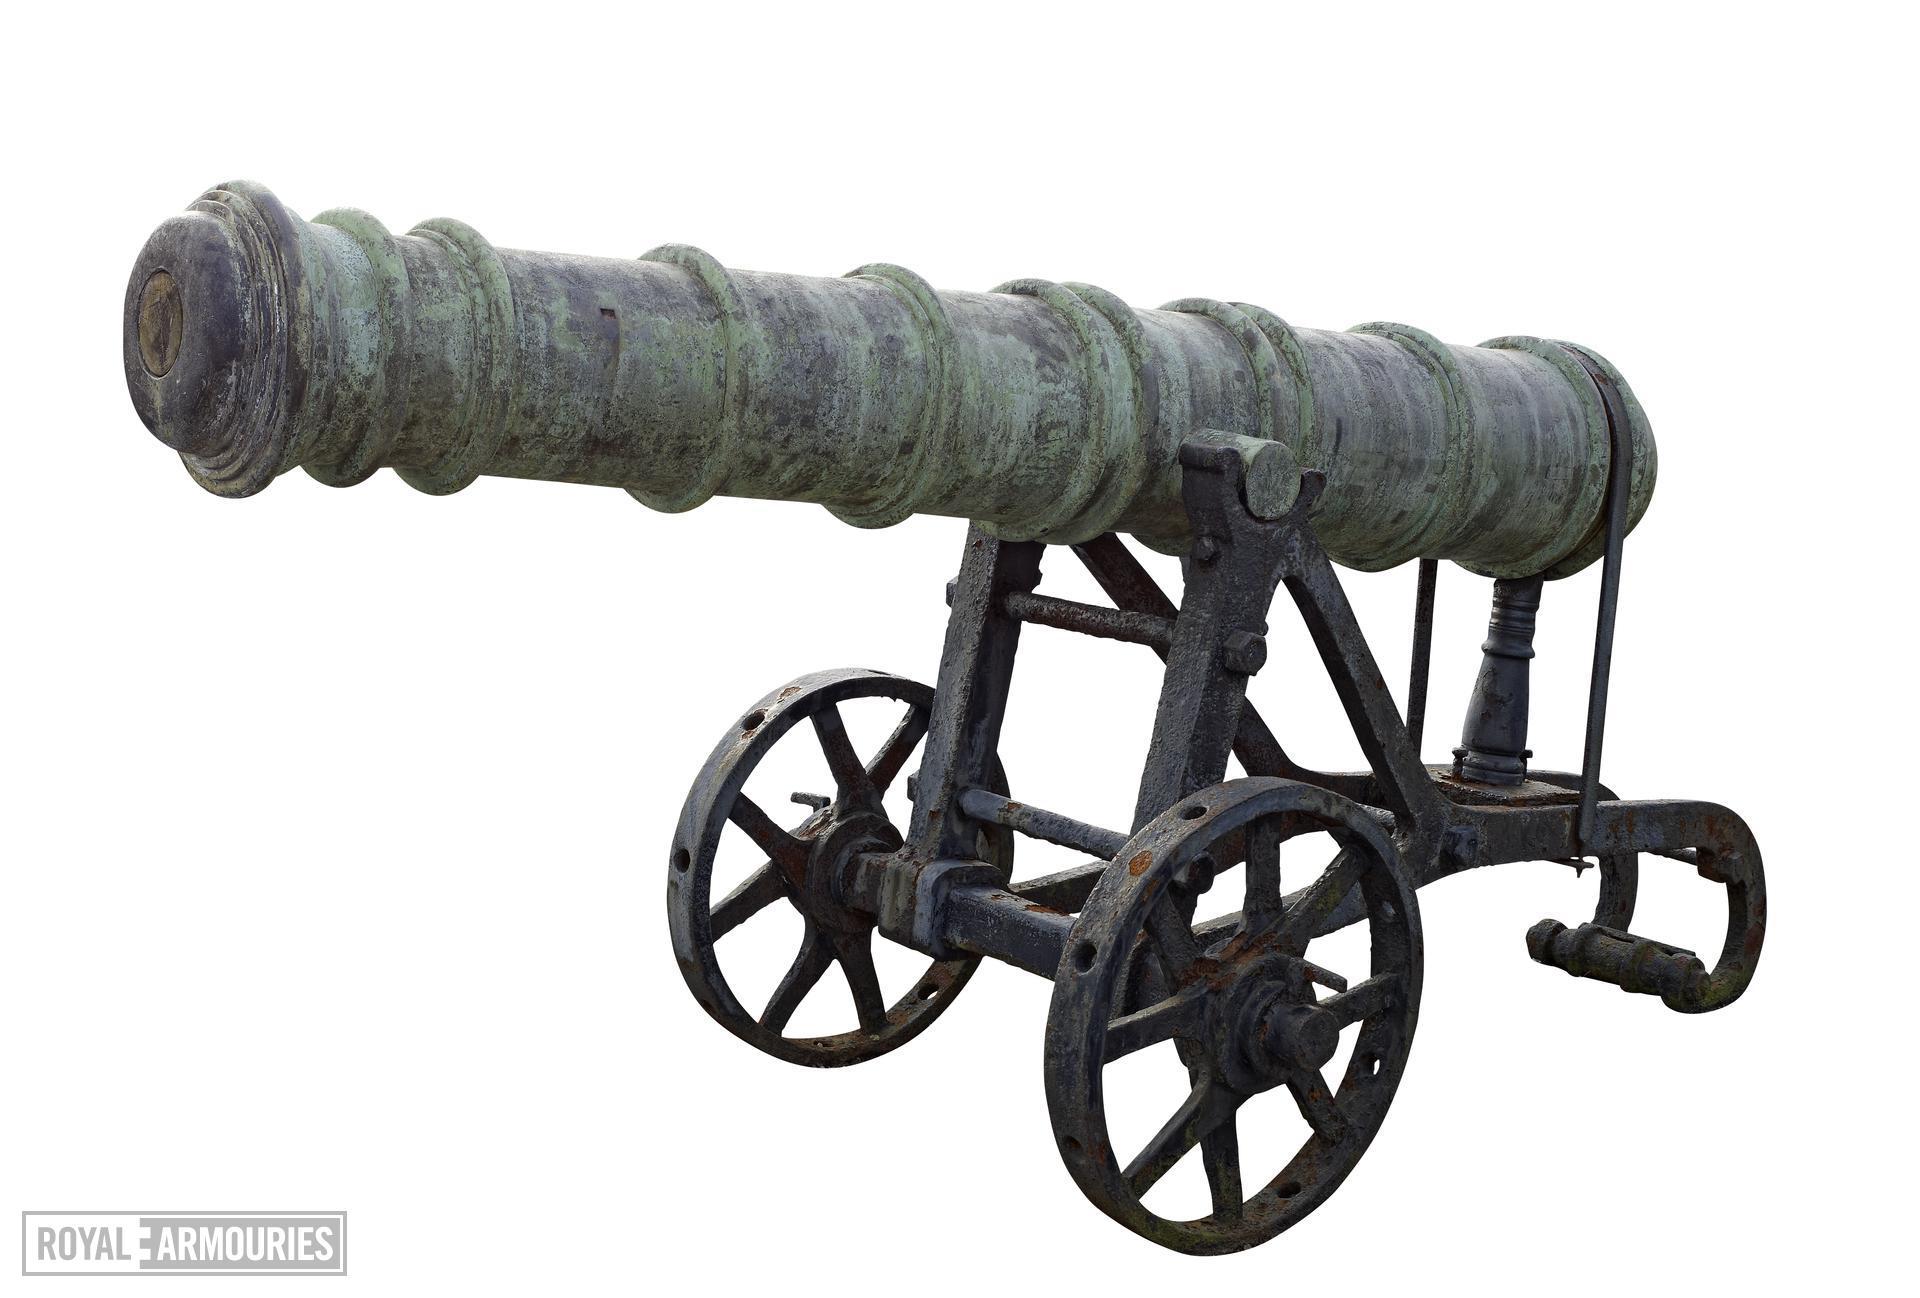 18 pr gun and garrison carriage Made of bronze